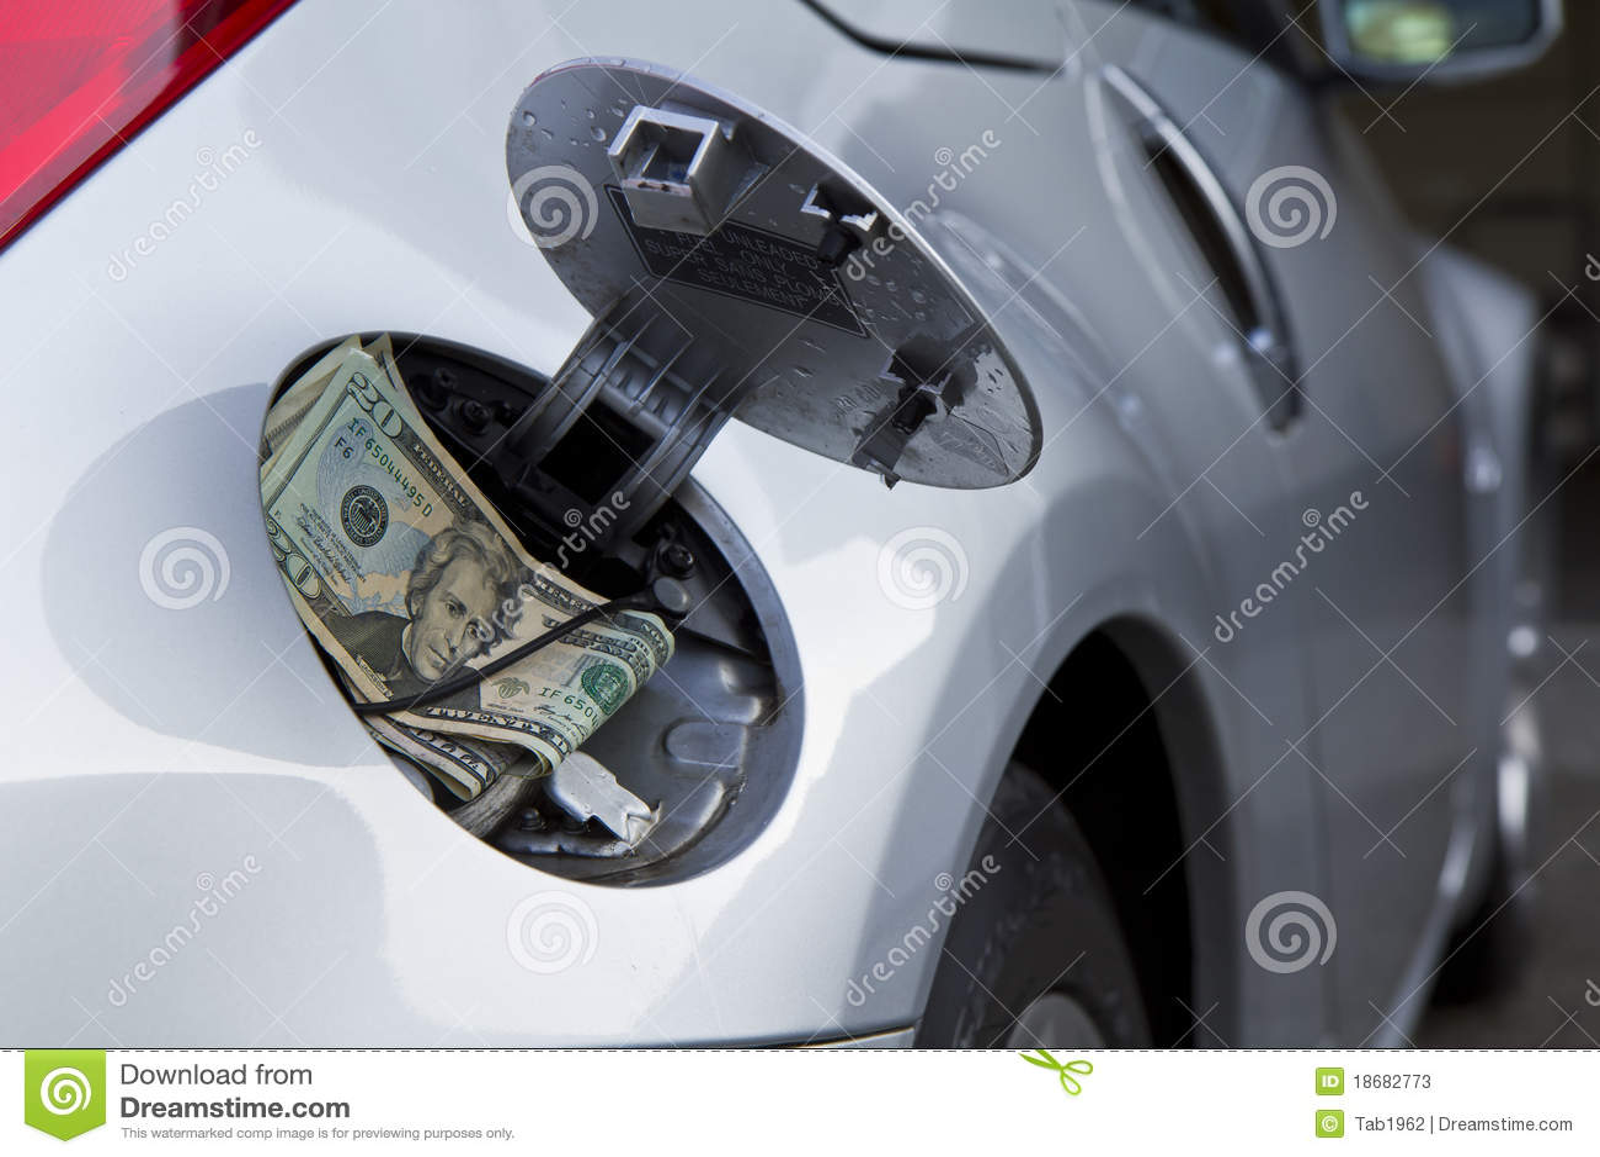 Automotive Gas Cap : Car gas cap and money stock photos image